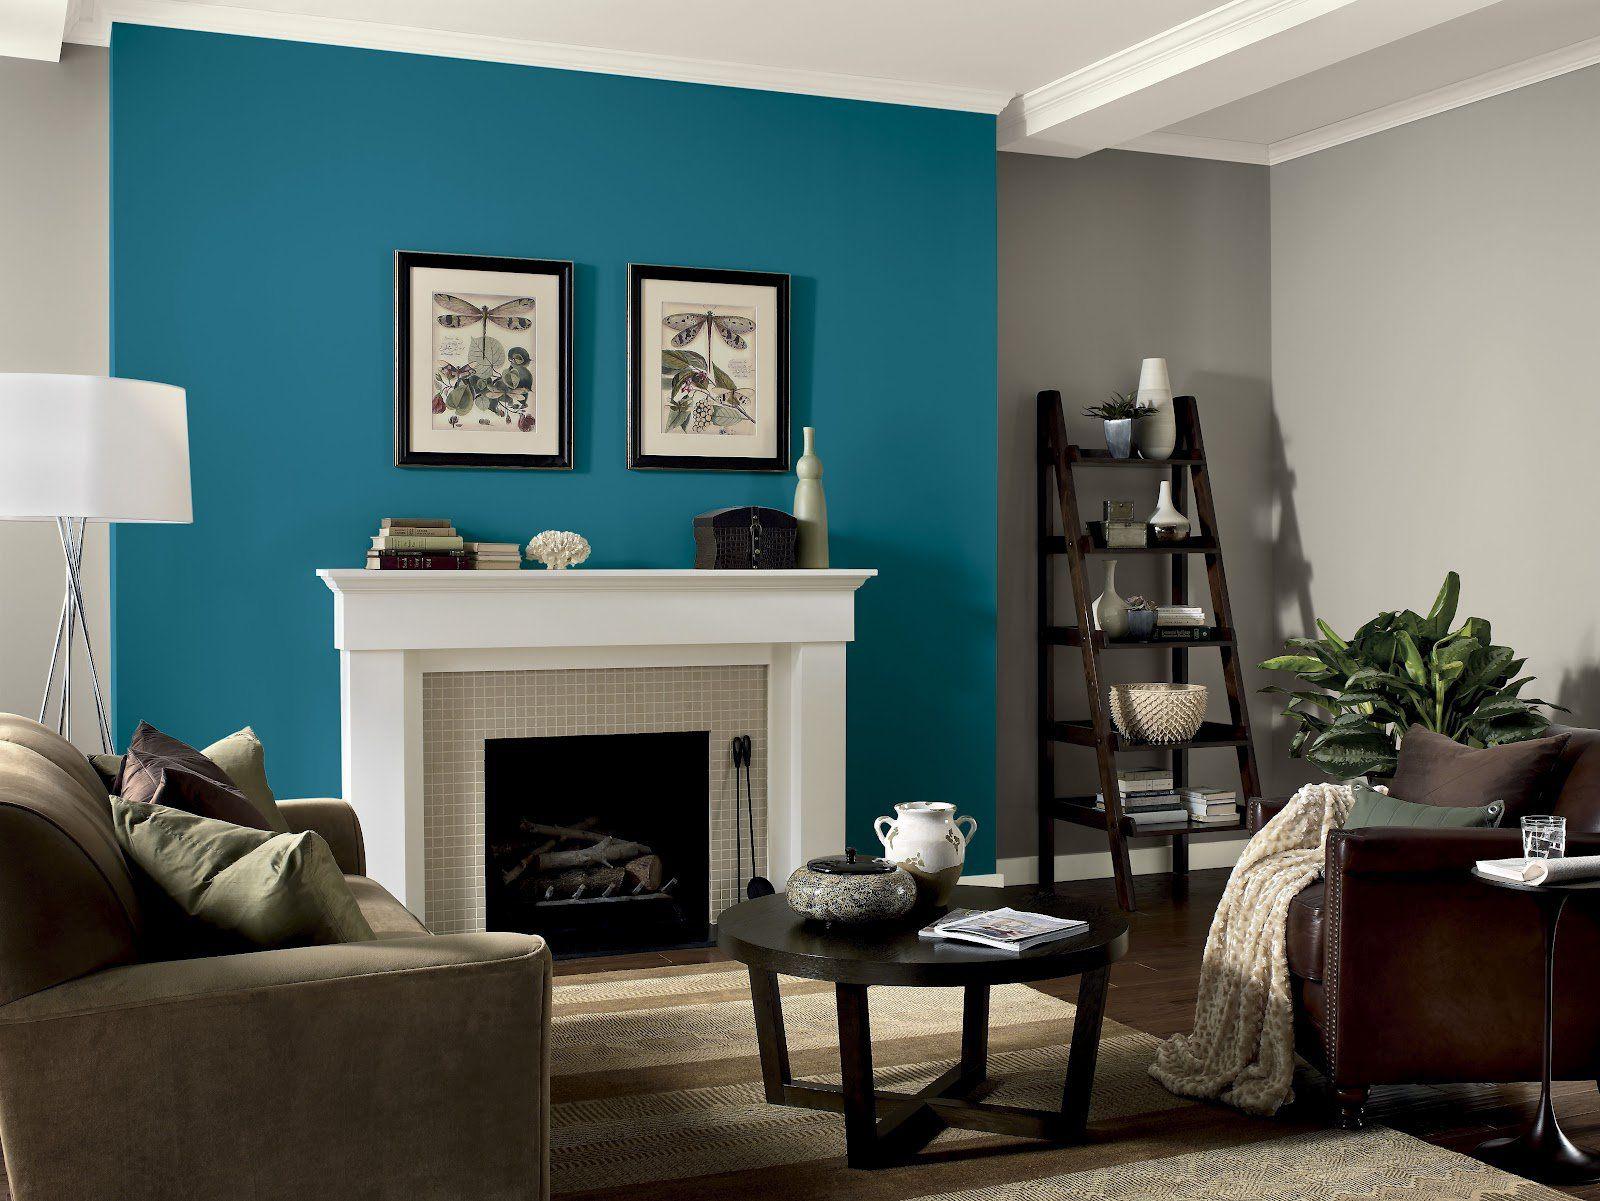 10 Warna Cat Ruang Tamu Sempit Sulap Ruangan Jadi Terasa Luas Istimewa Interiordesign Id